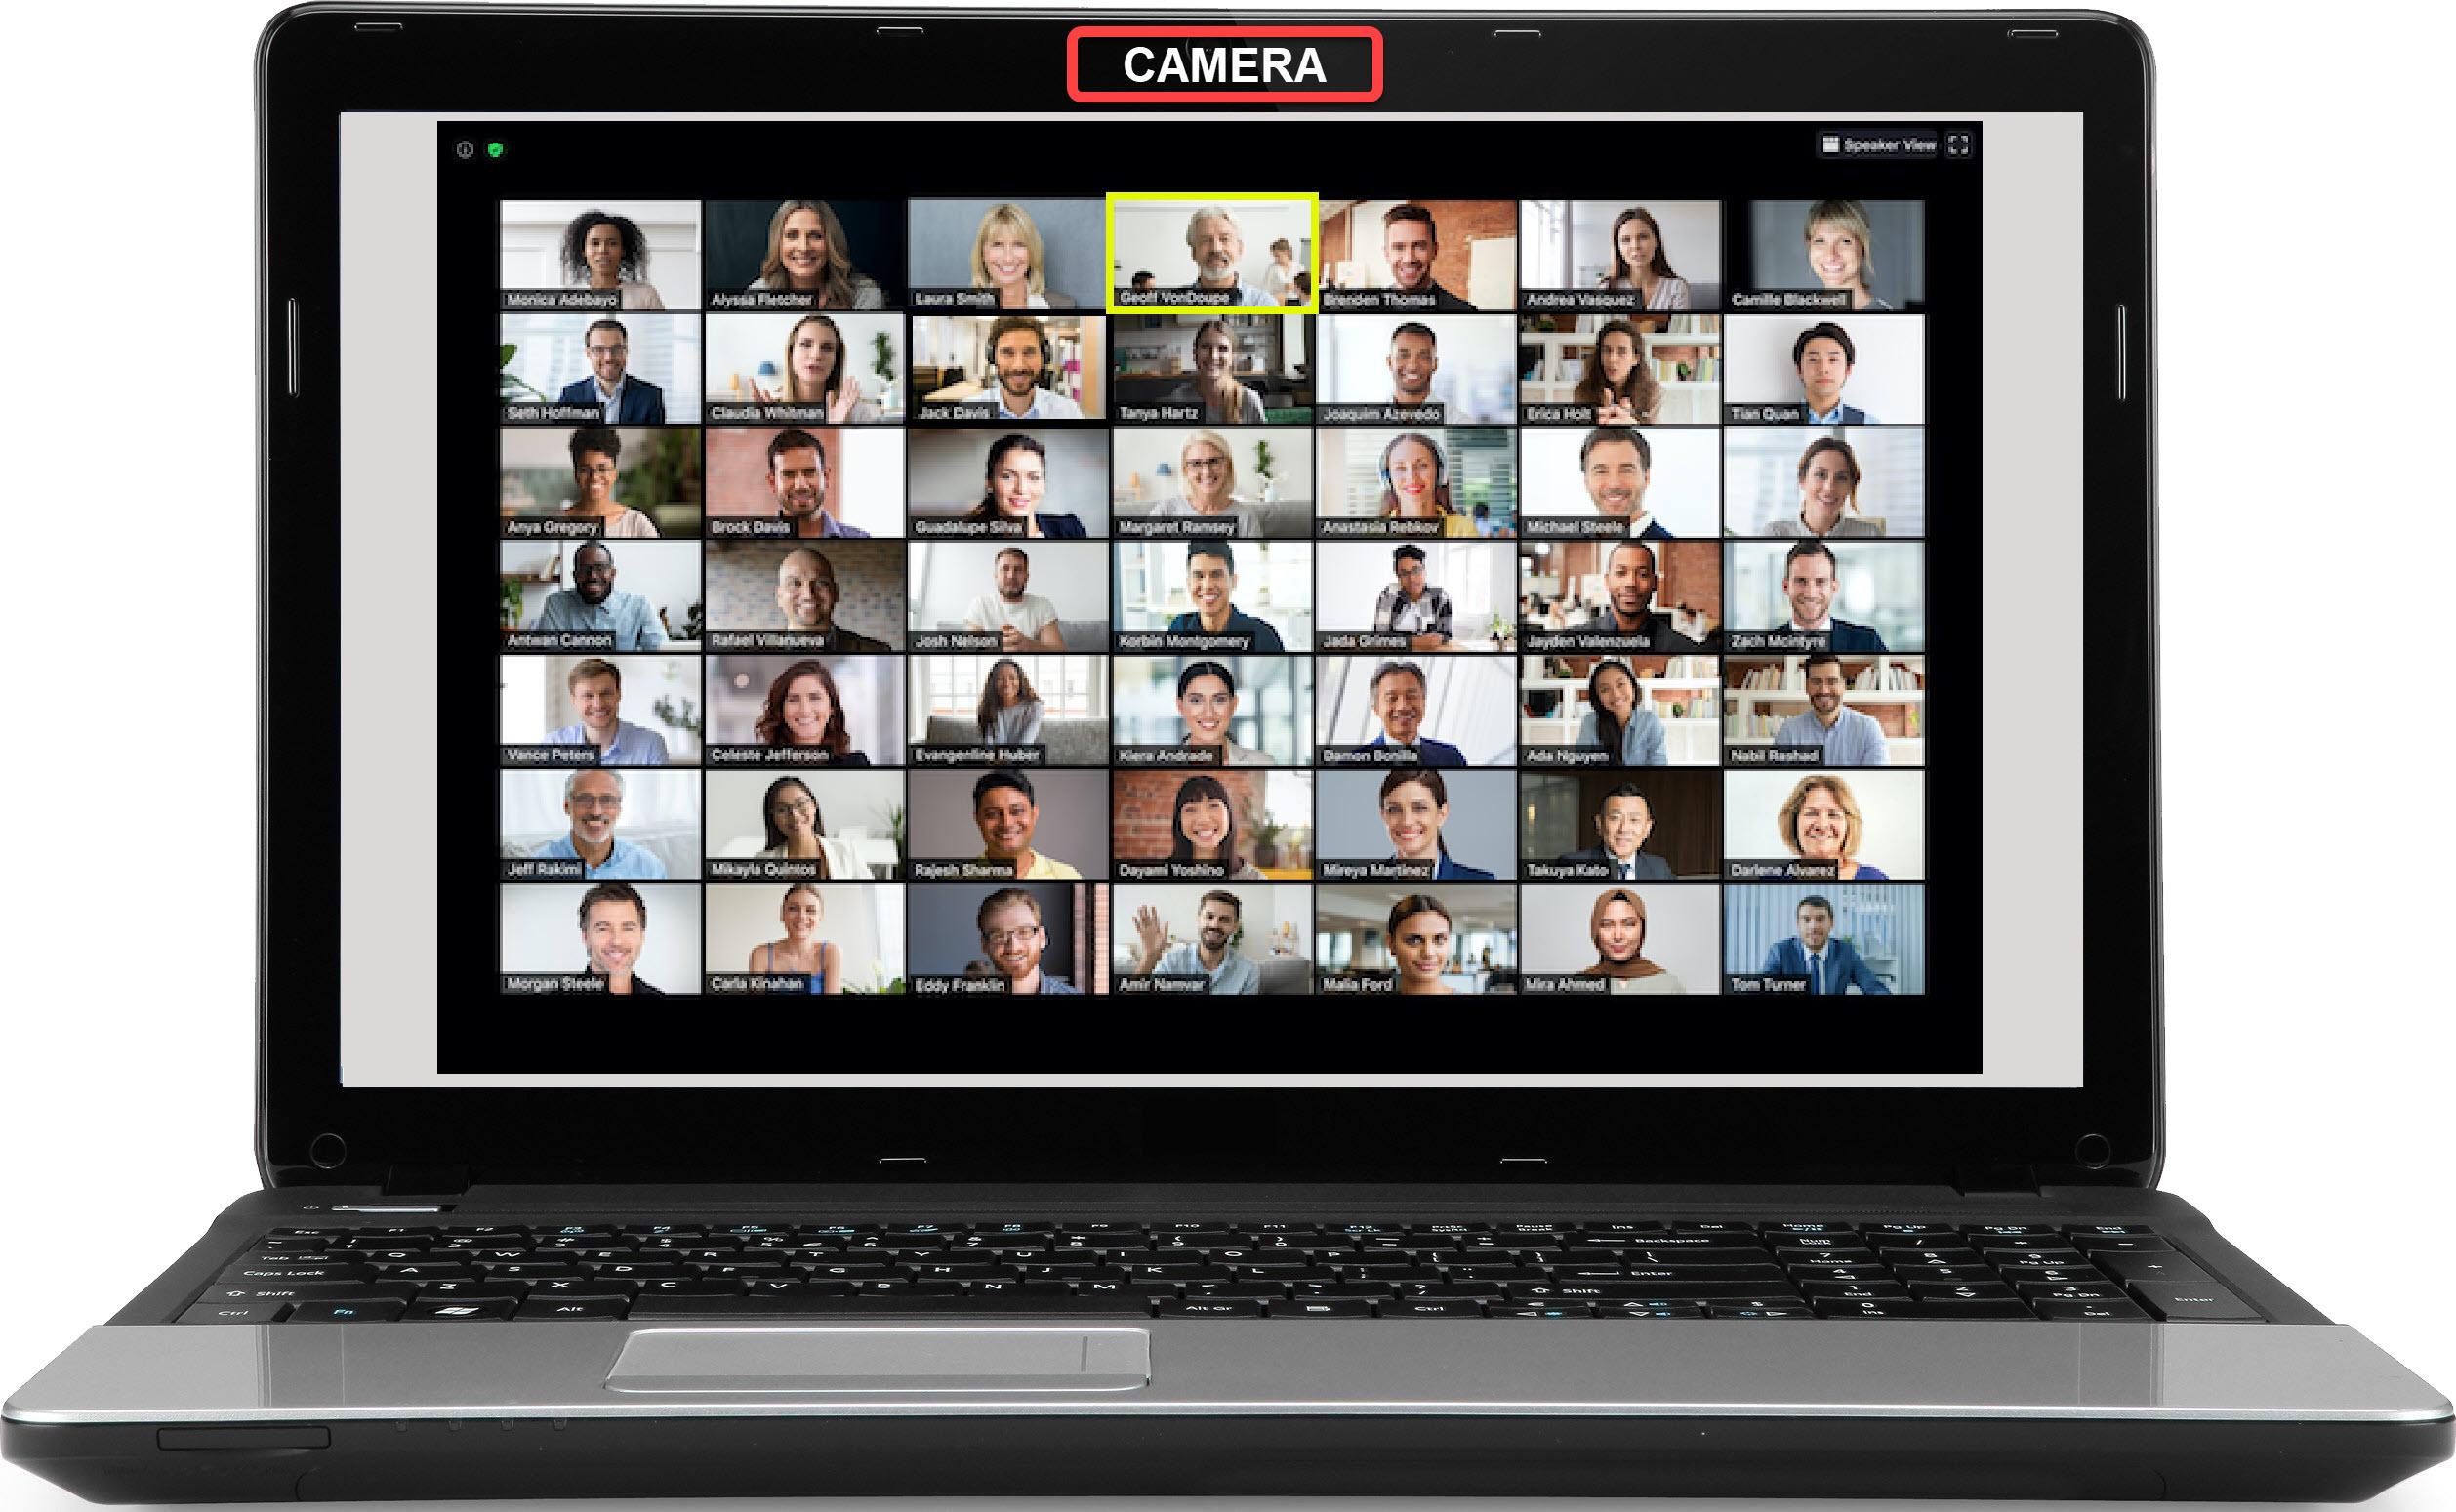 Zoom eye contact - 50 videos